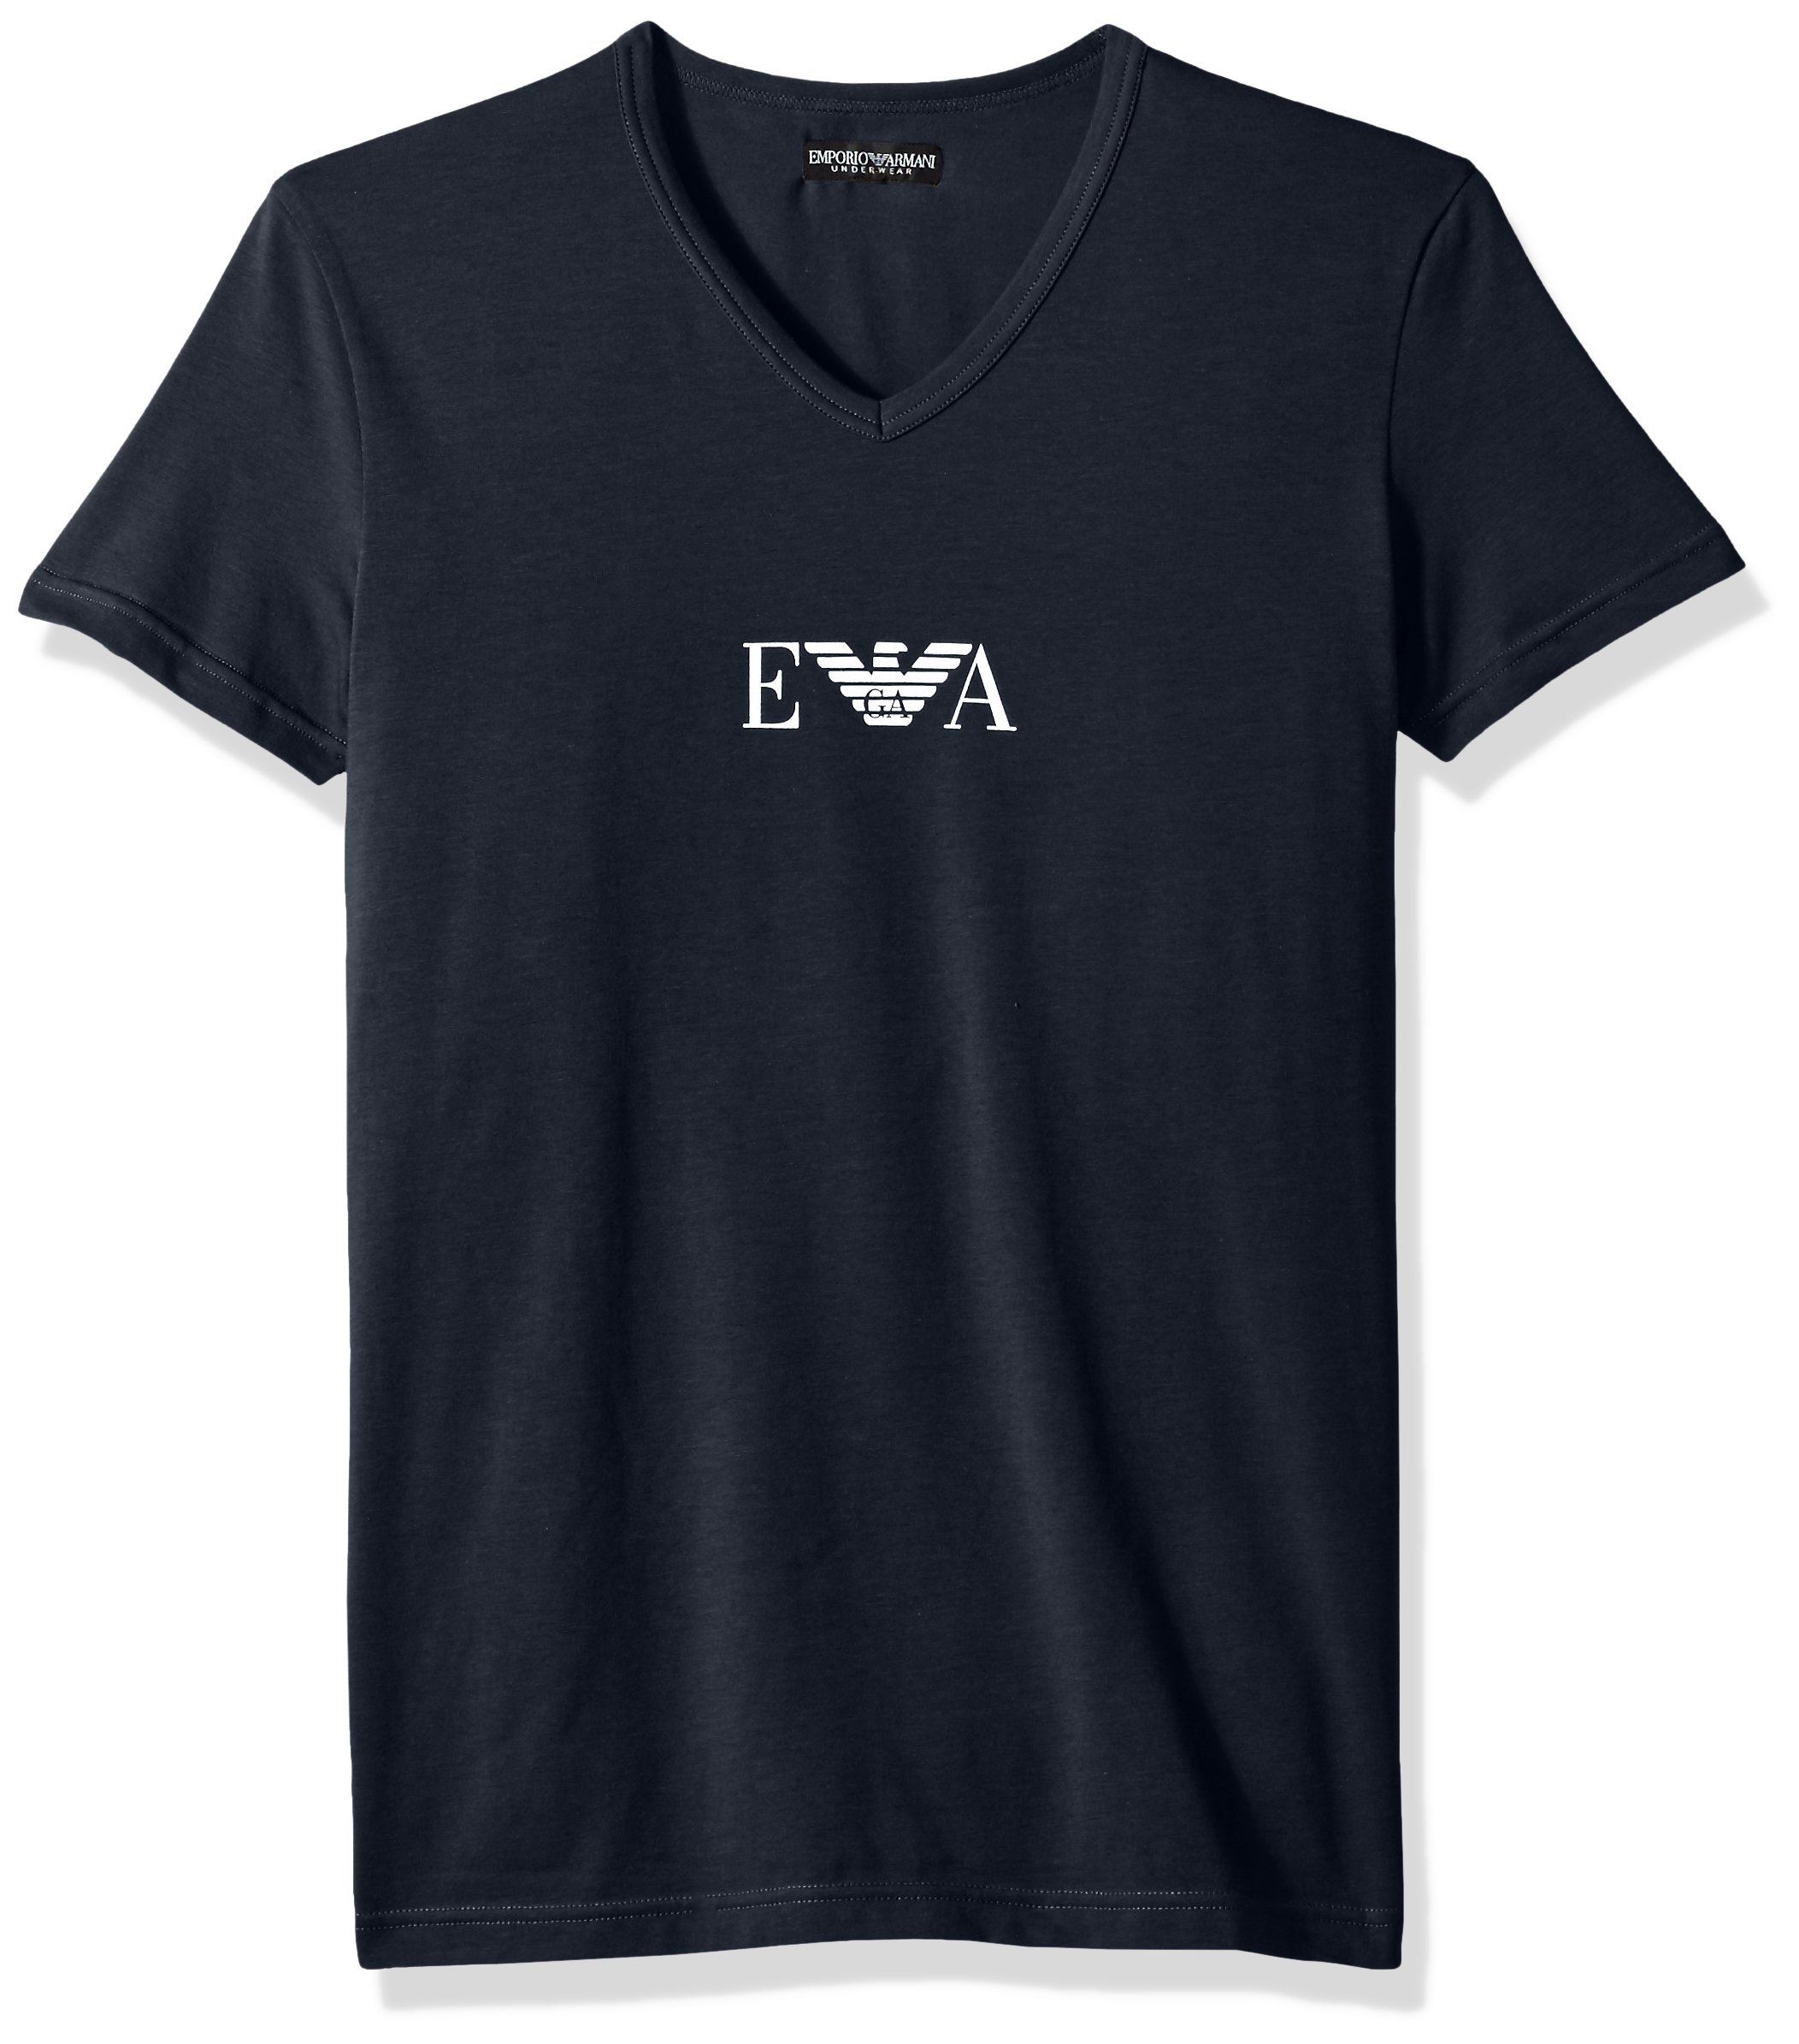 Emporio Armani Men's Stretch Cotton Multipack Vneck T-Shirt, Marine, M